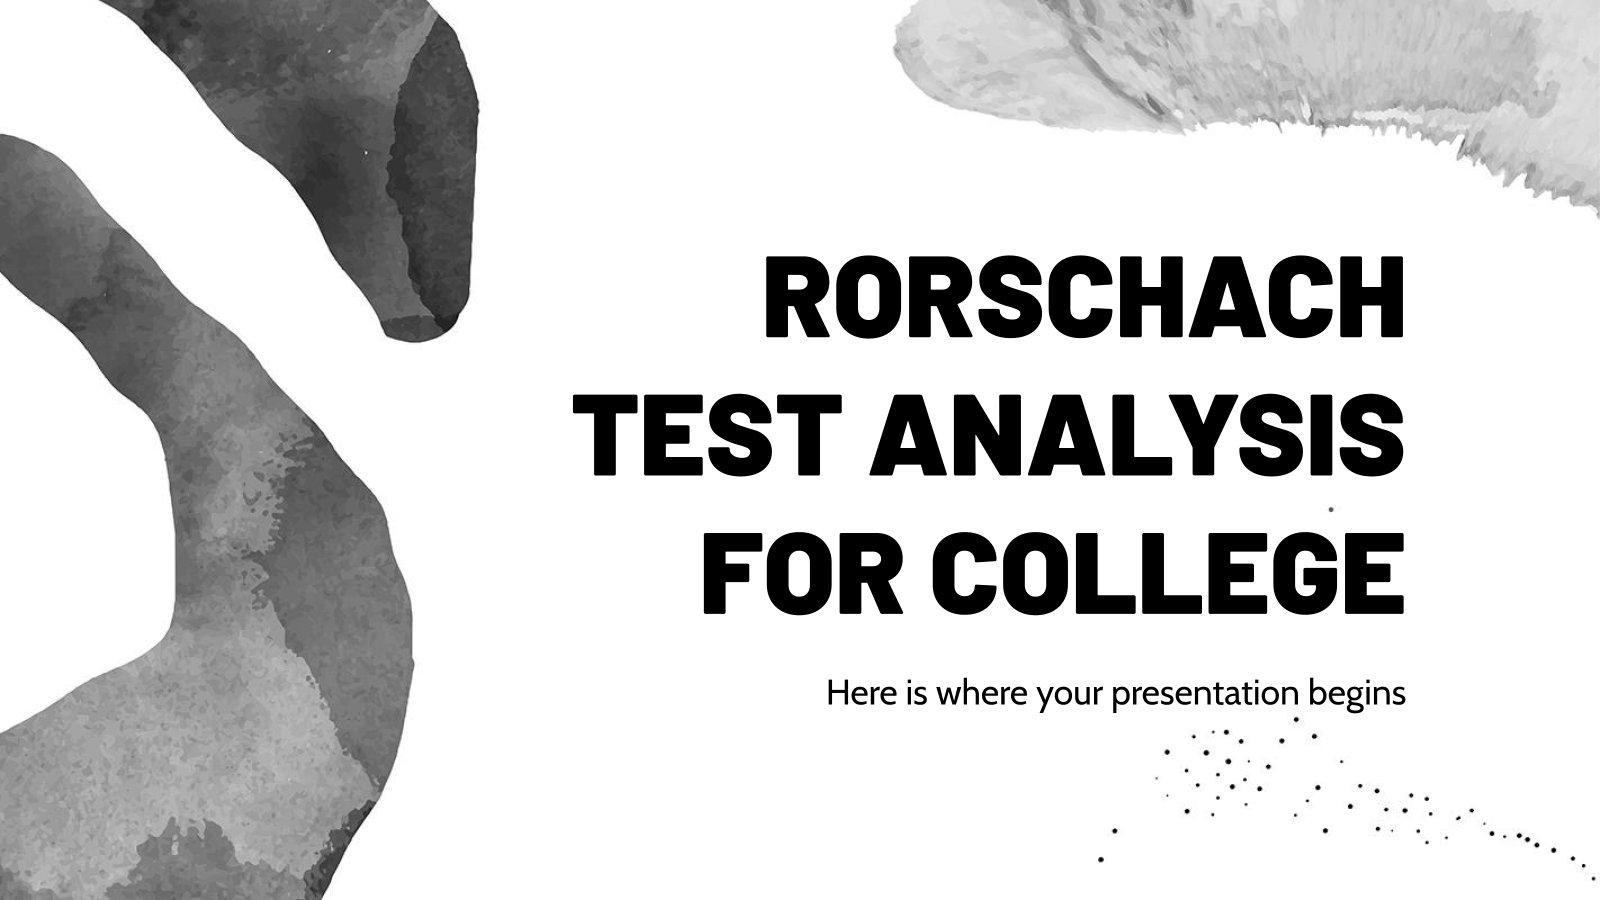 Rorschach Test Analysis for College presentation template